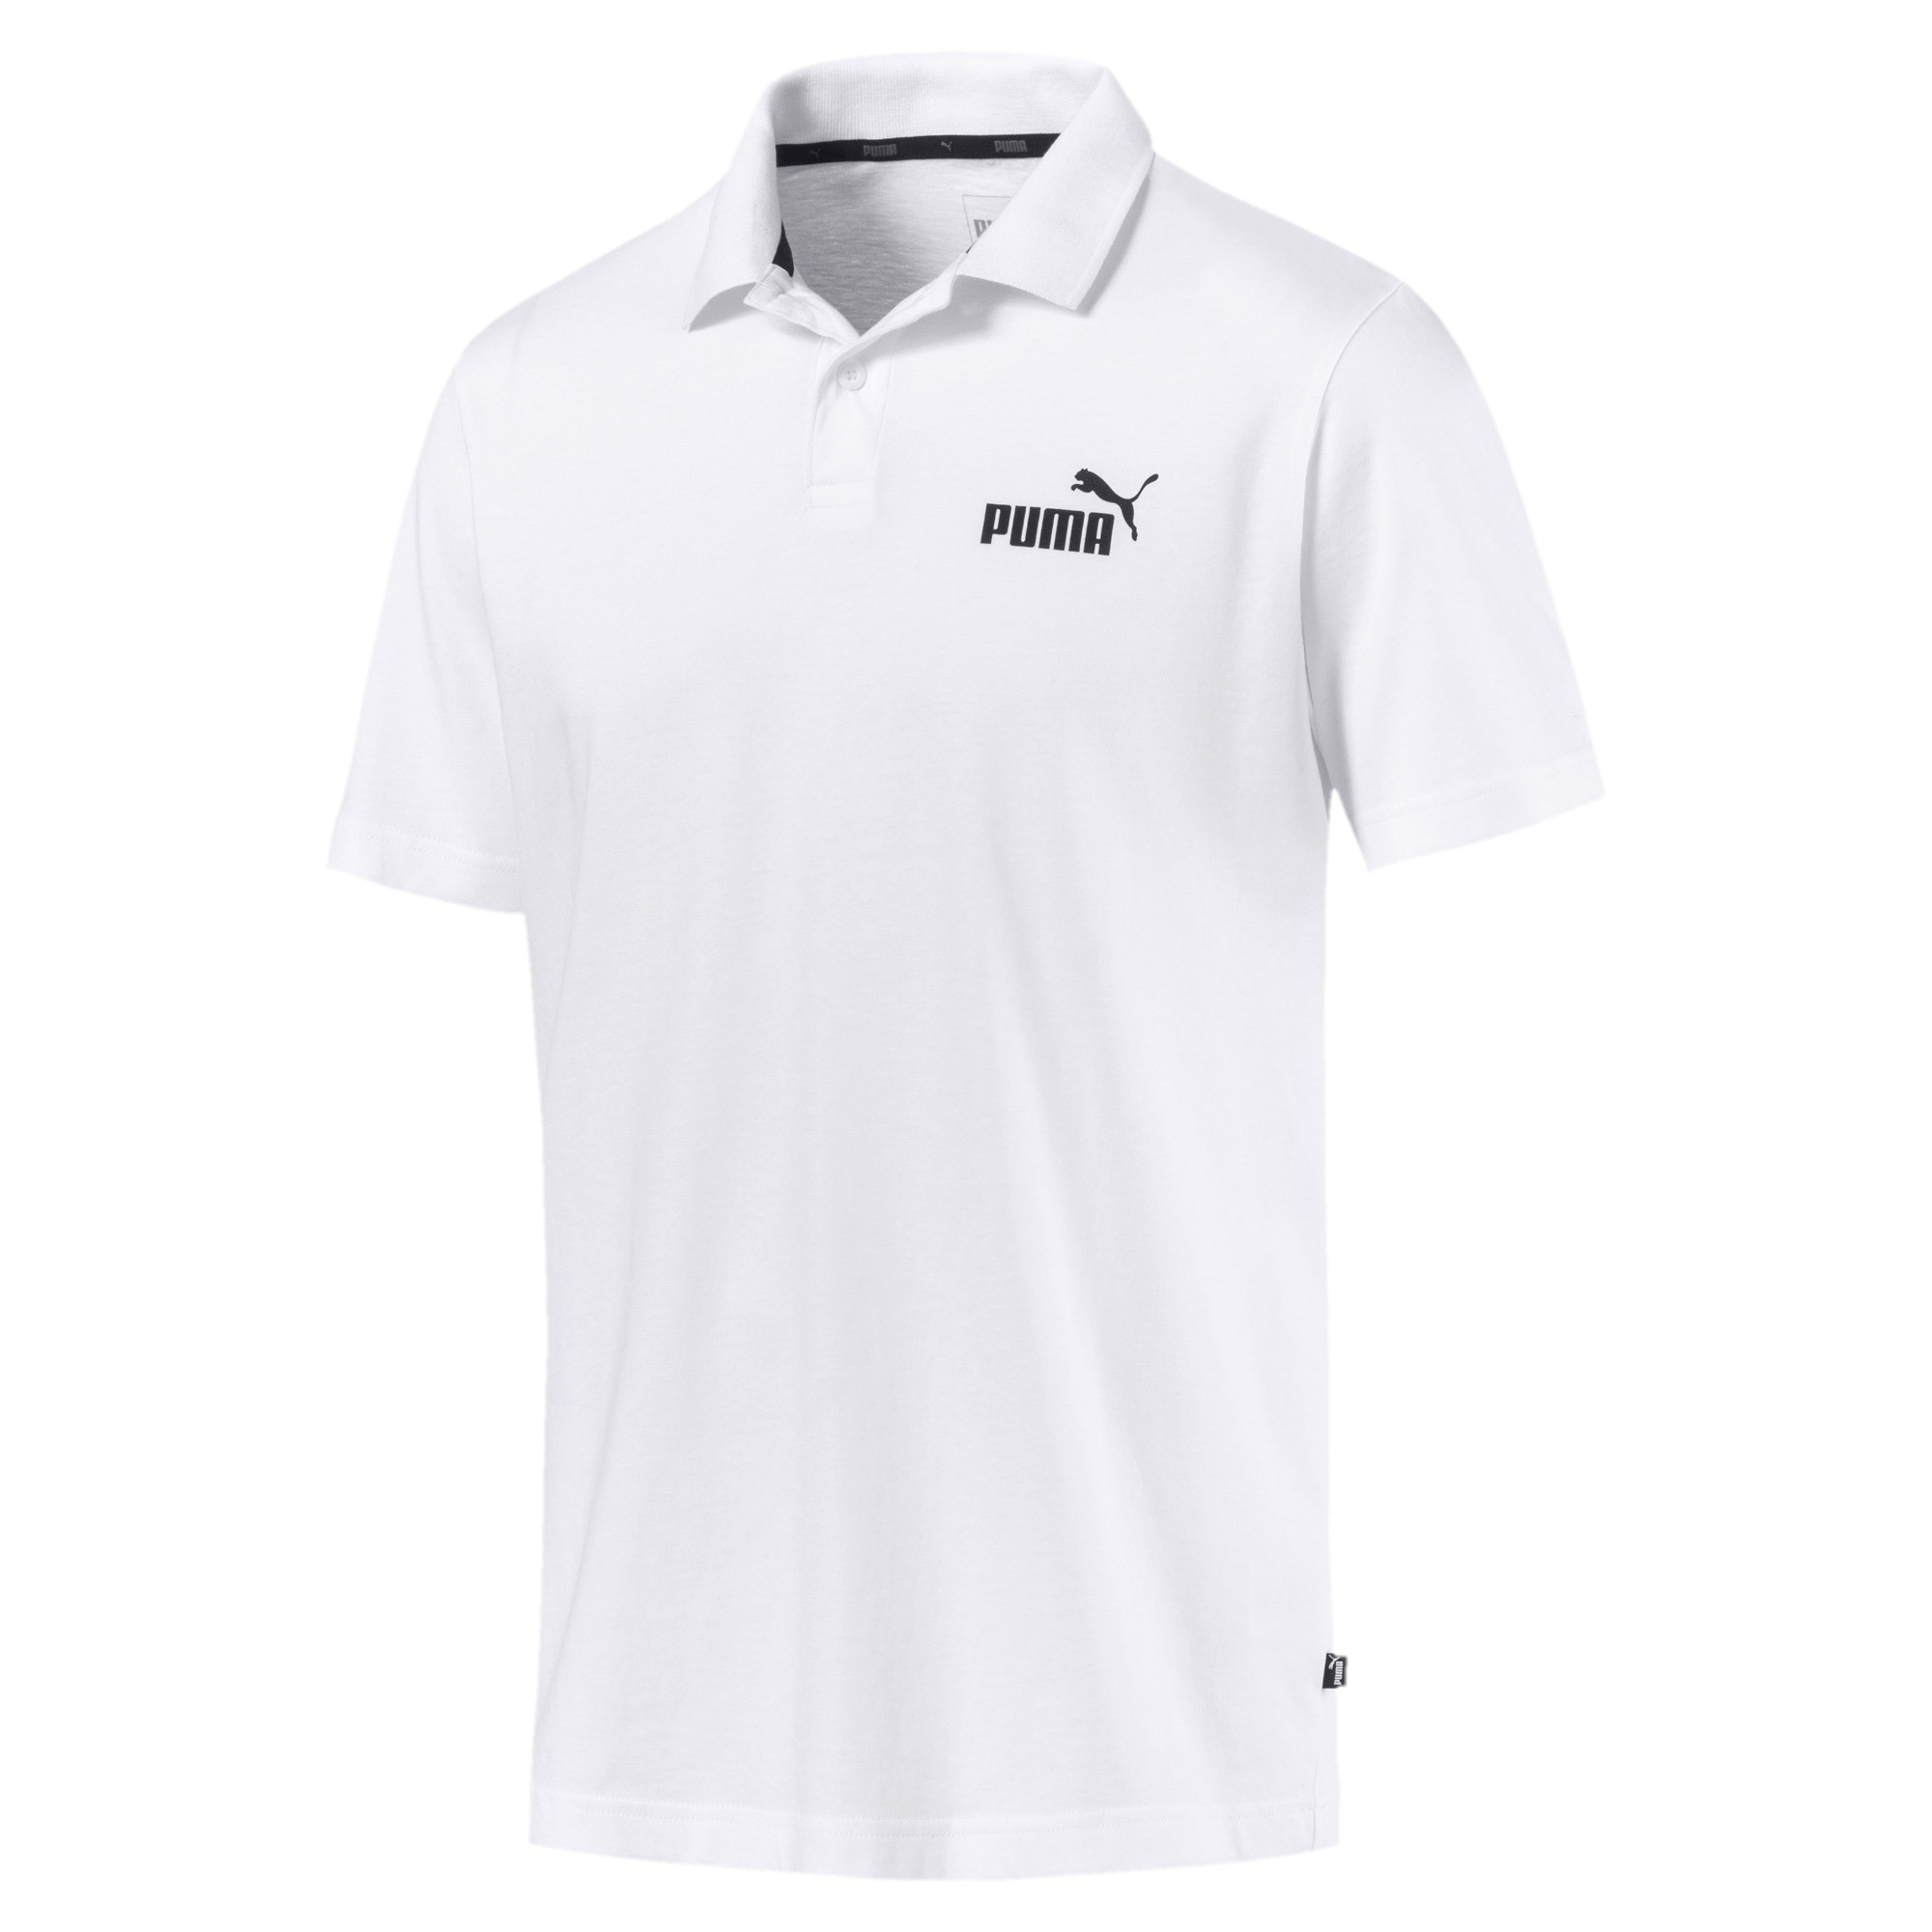 PUMA-Essentials-Men-039-s-Jersey-Polo-Men-Polo-Basics thumbnail 13